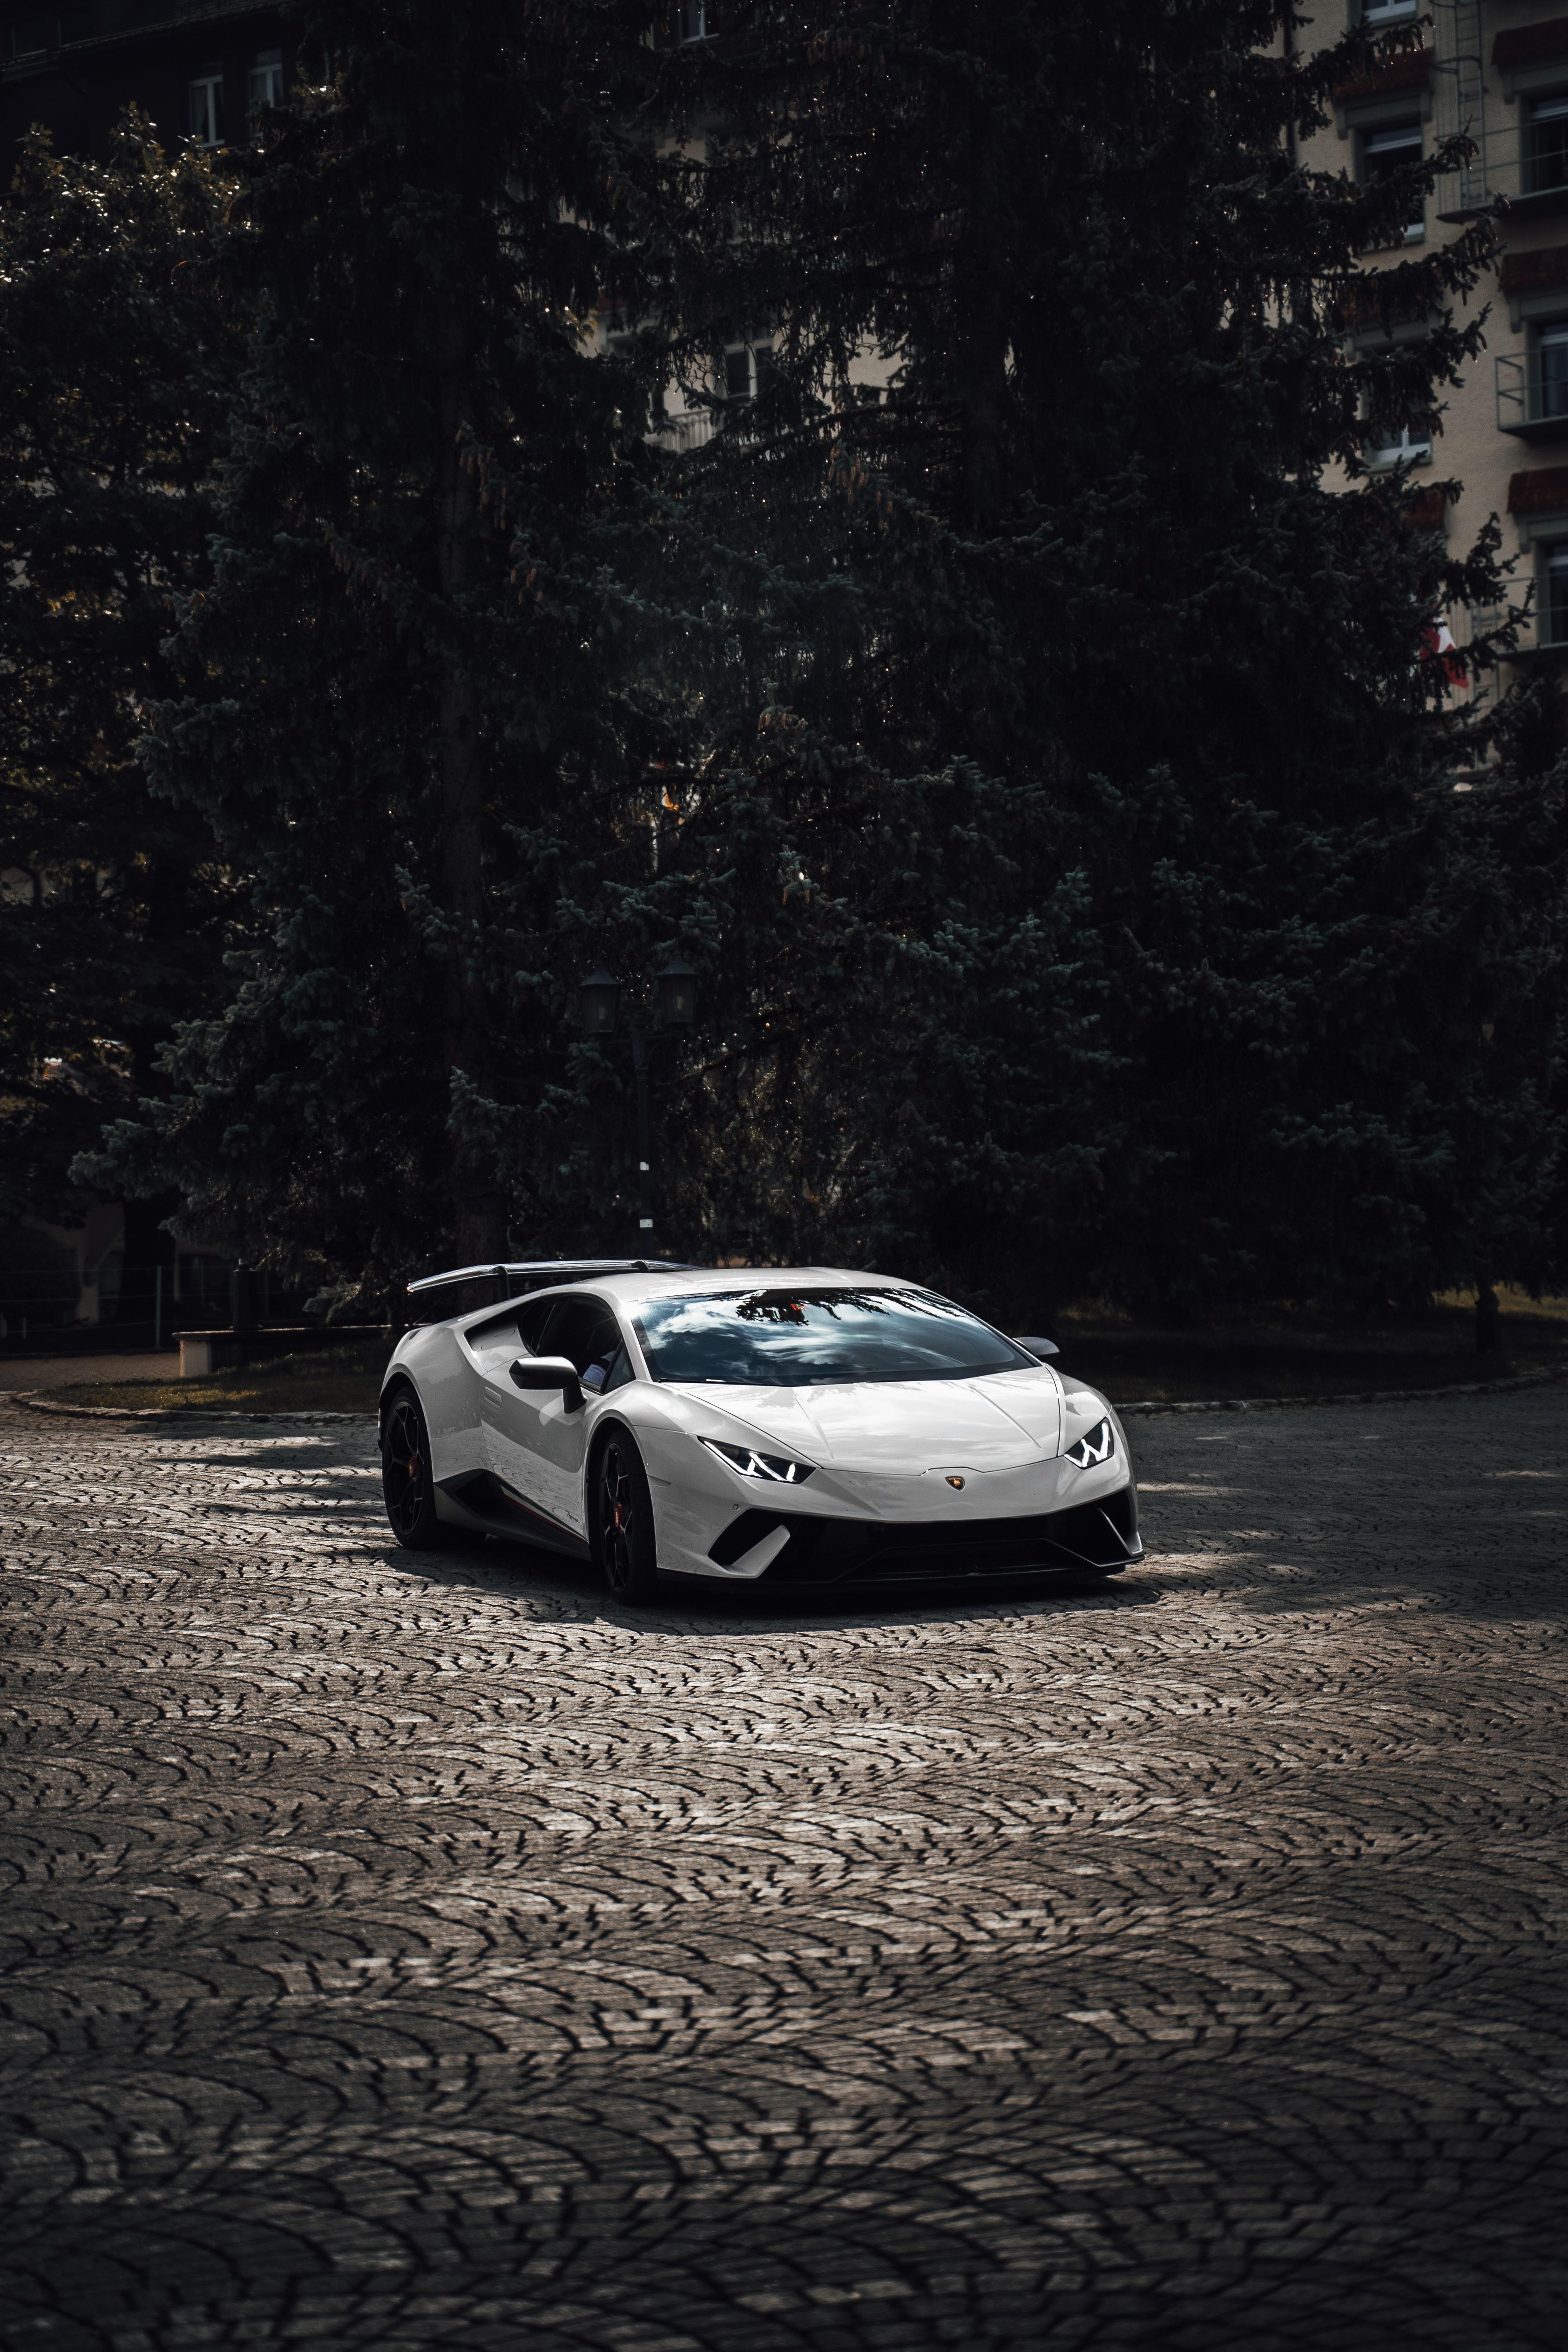 62462 Заставки и Обои Ламборджини (Lamborghini) на телефон. Скачать Ламборджини (Lamborghini), Lamborghini Aventador, Спорткар, Белый, Тачки (Cars), Суперкар картинки бесплатно